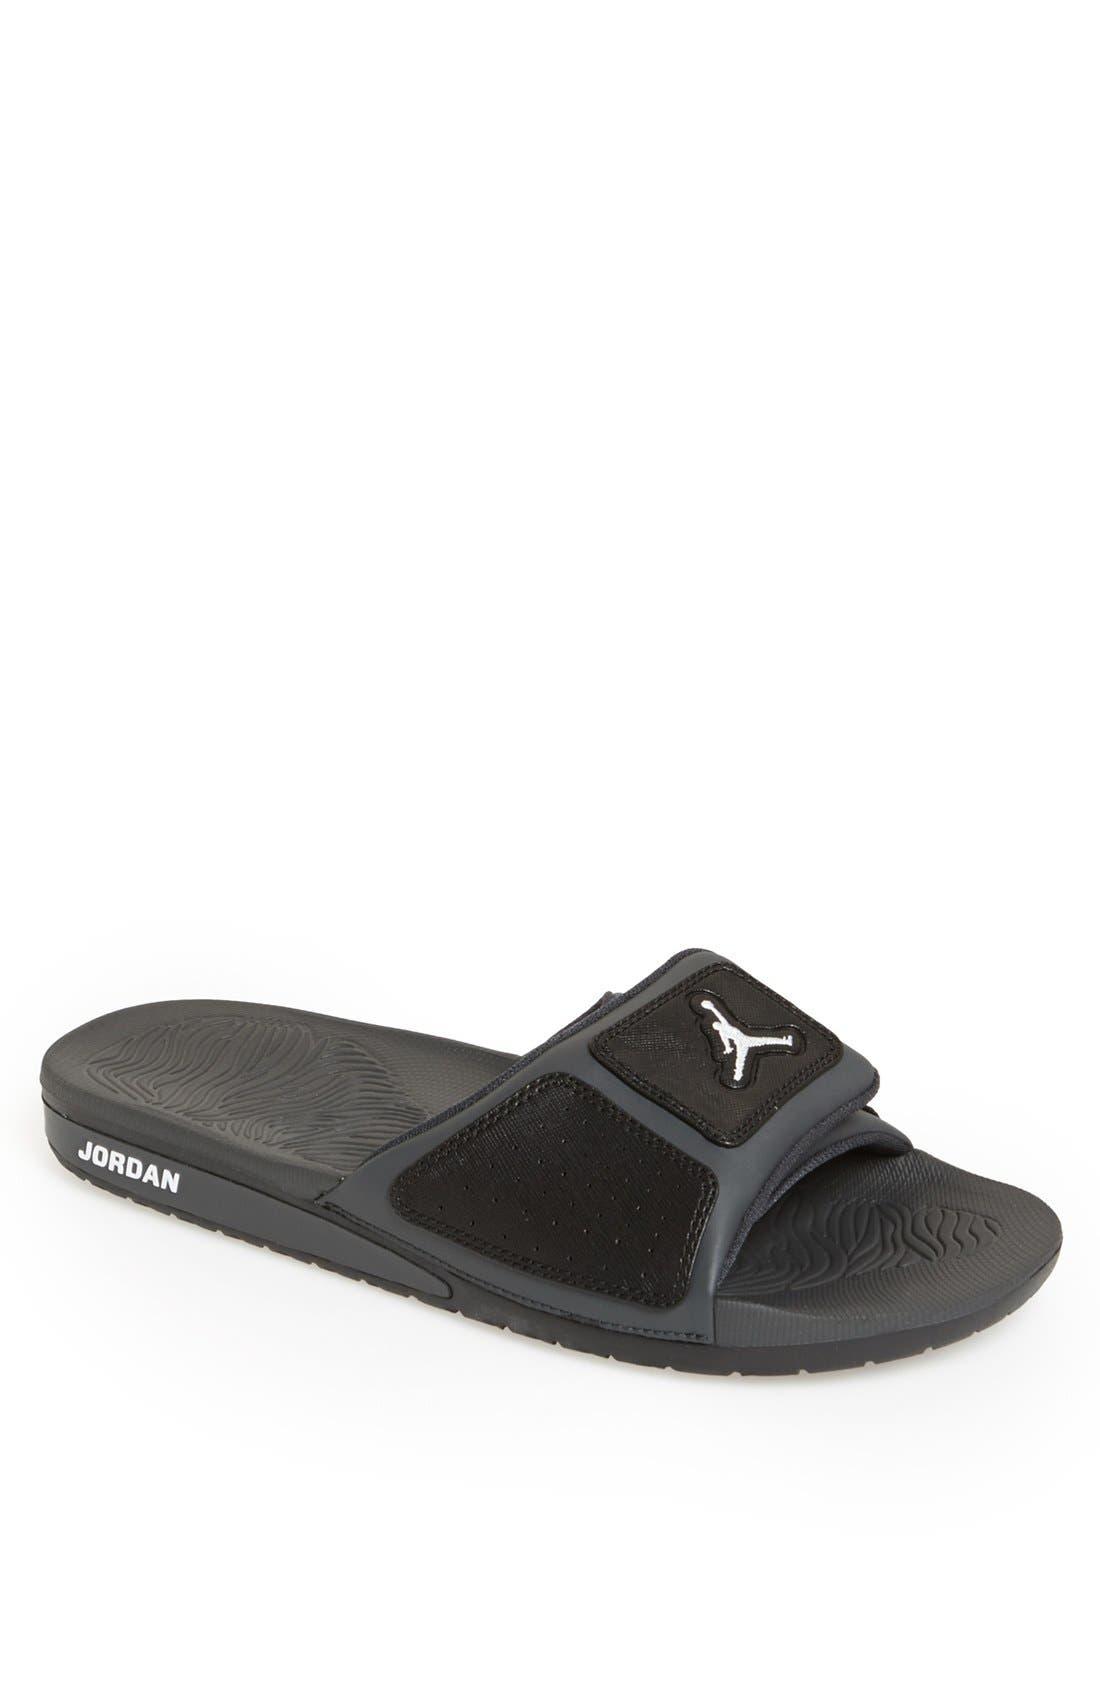 Main Image - Nike 'Jordan Hydro 3' Sandal